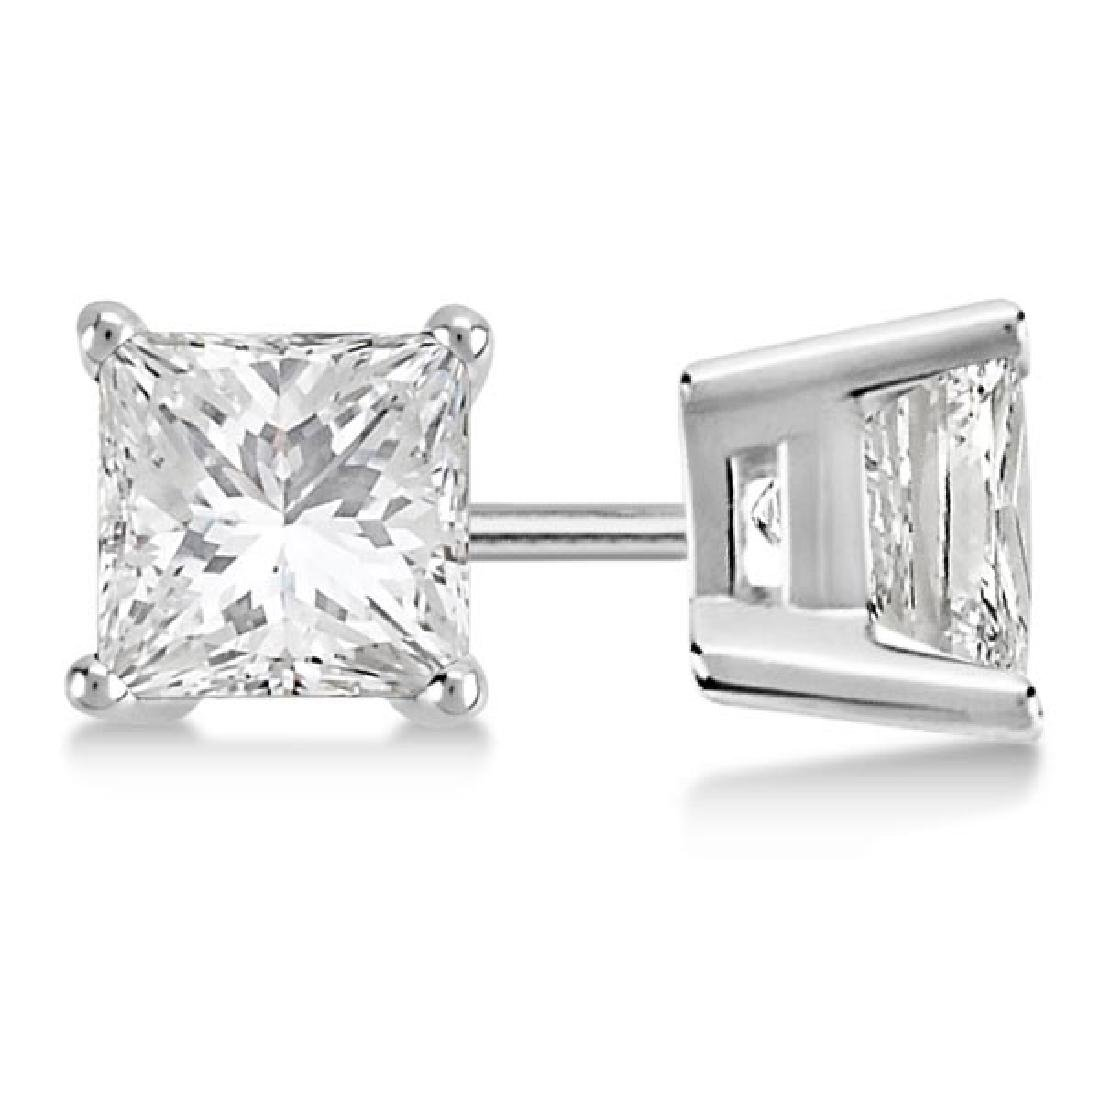 Certified 1.01 CTW Princess Diamond Stud Earrings F/SI1